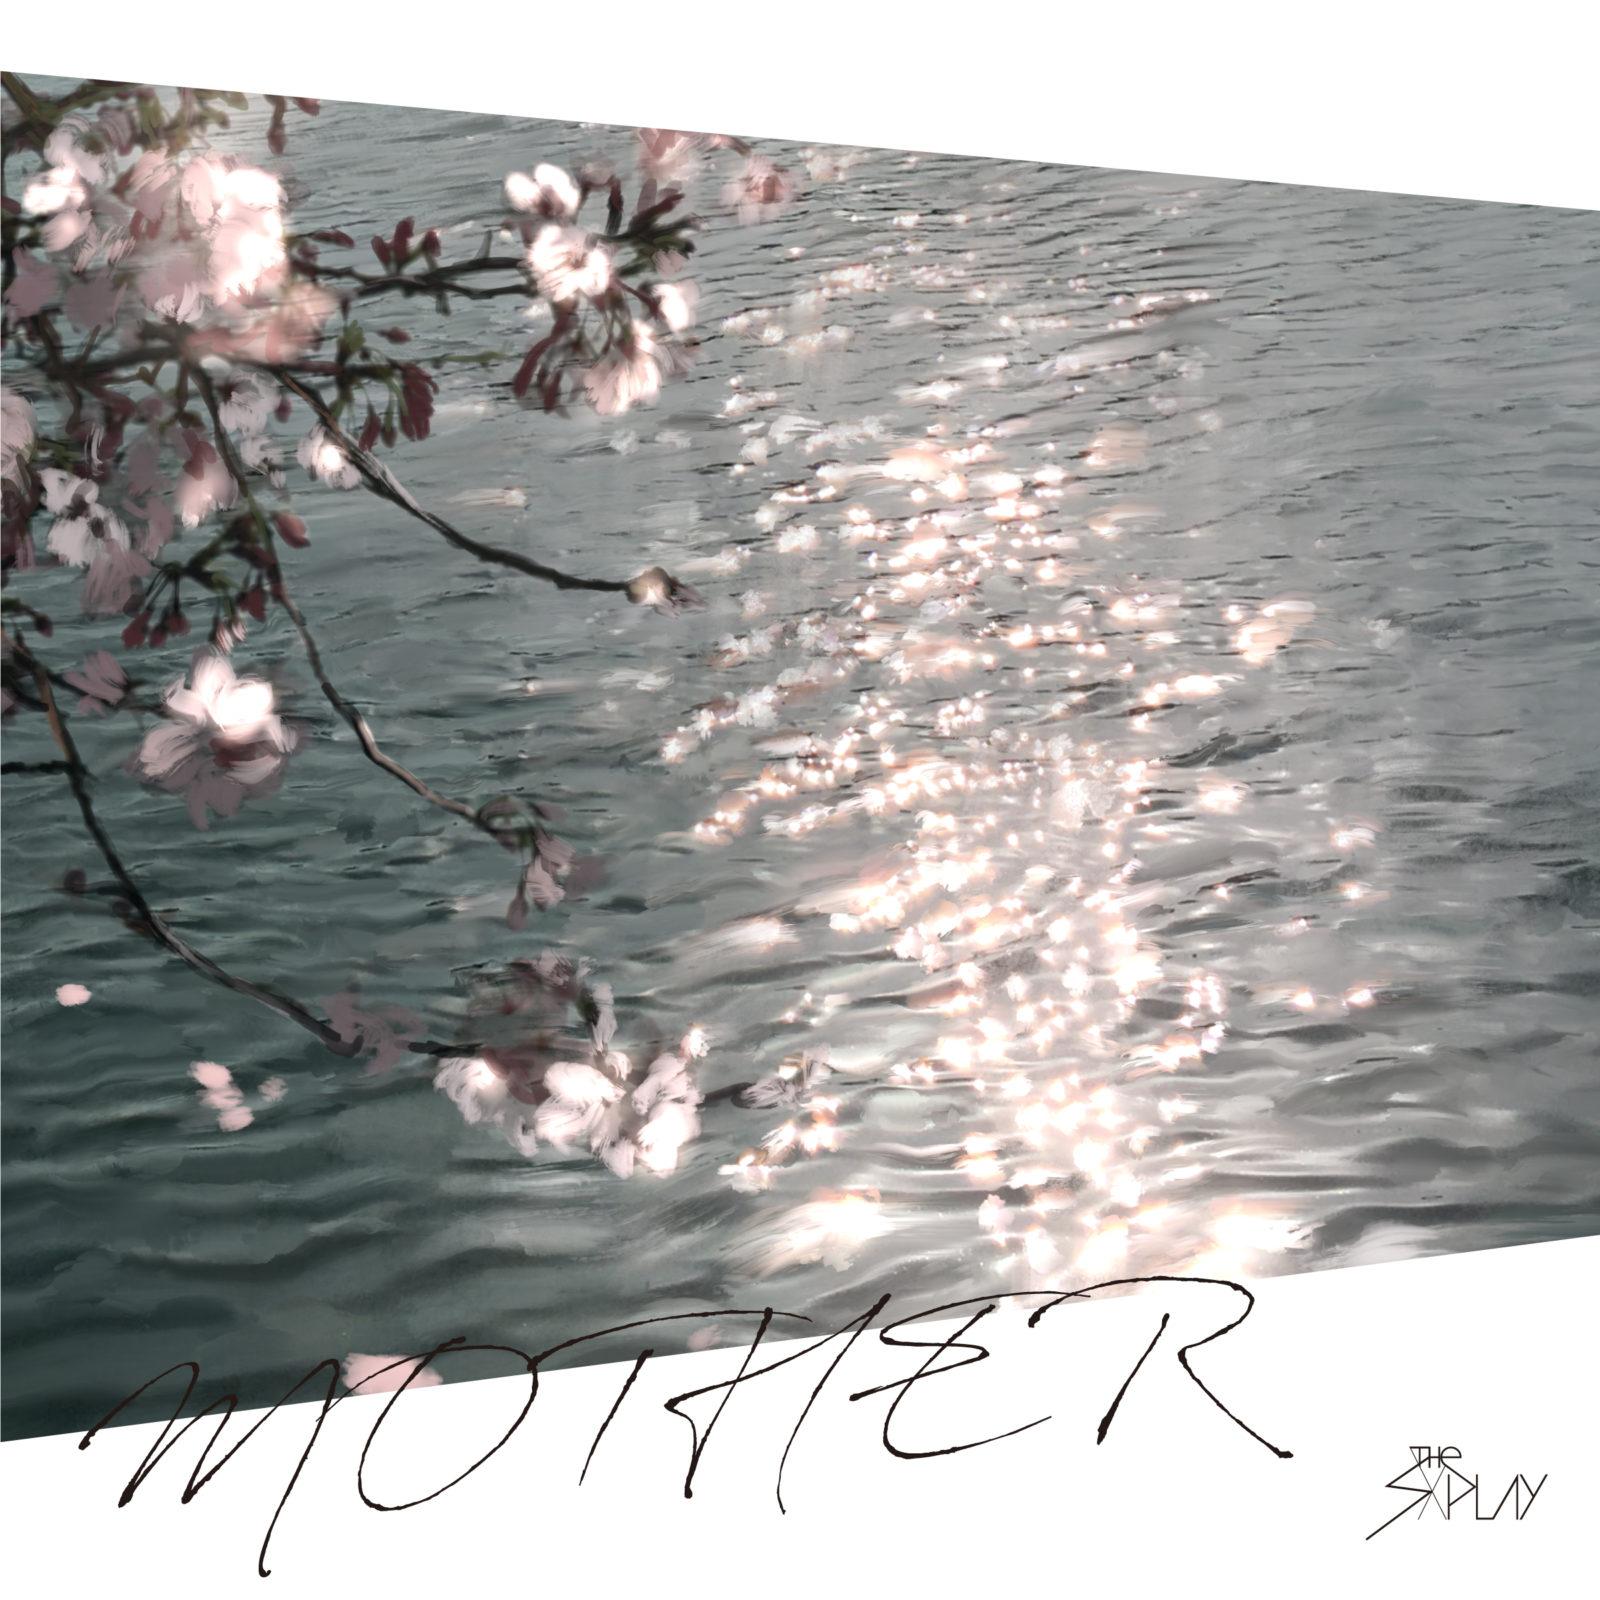 "THE SxPLAY(菅原紗由理) 5ヶ月連続リリース第一弾!世界1,000万DLを超える人気スマホ音楽ゲーム""VOEZ""タイアップソング『MOTHER』配信スタートサムネイル画像"